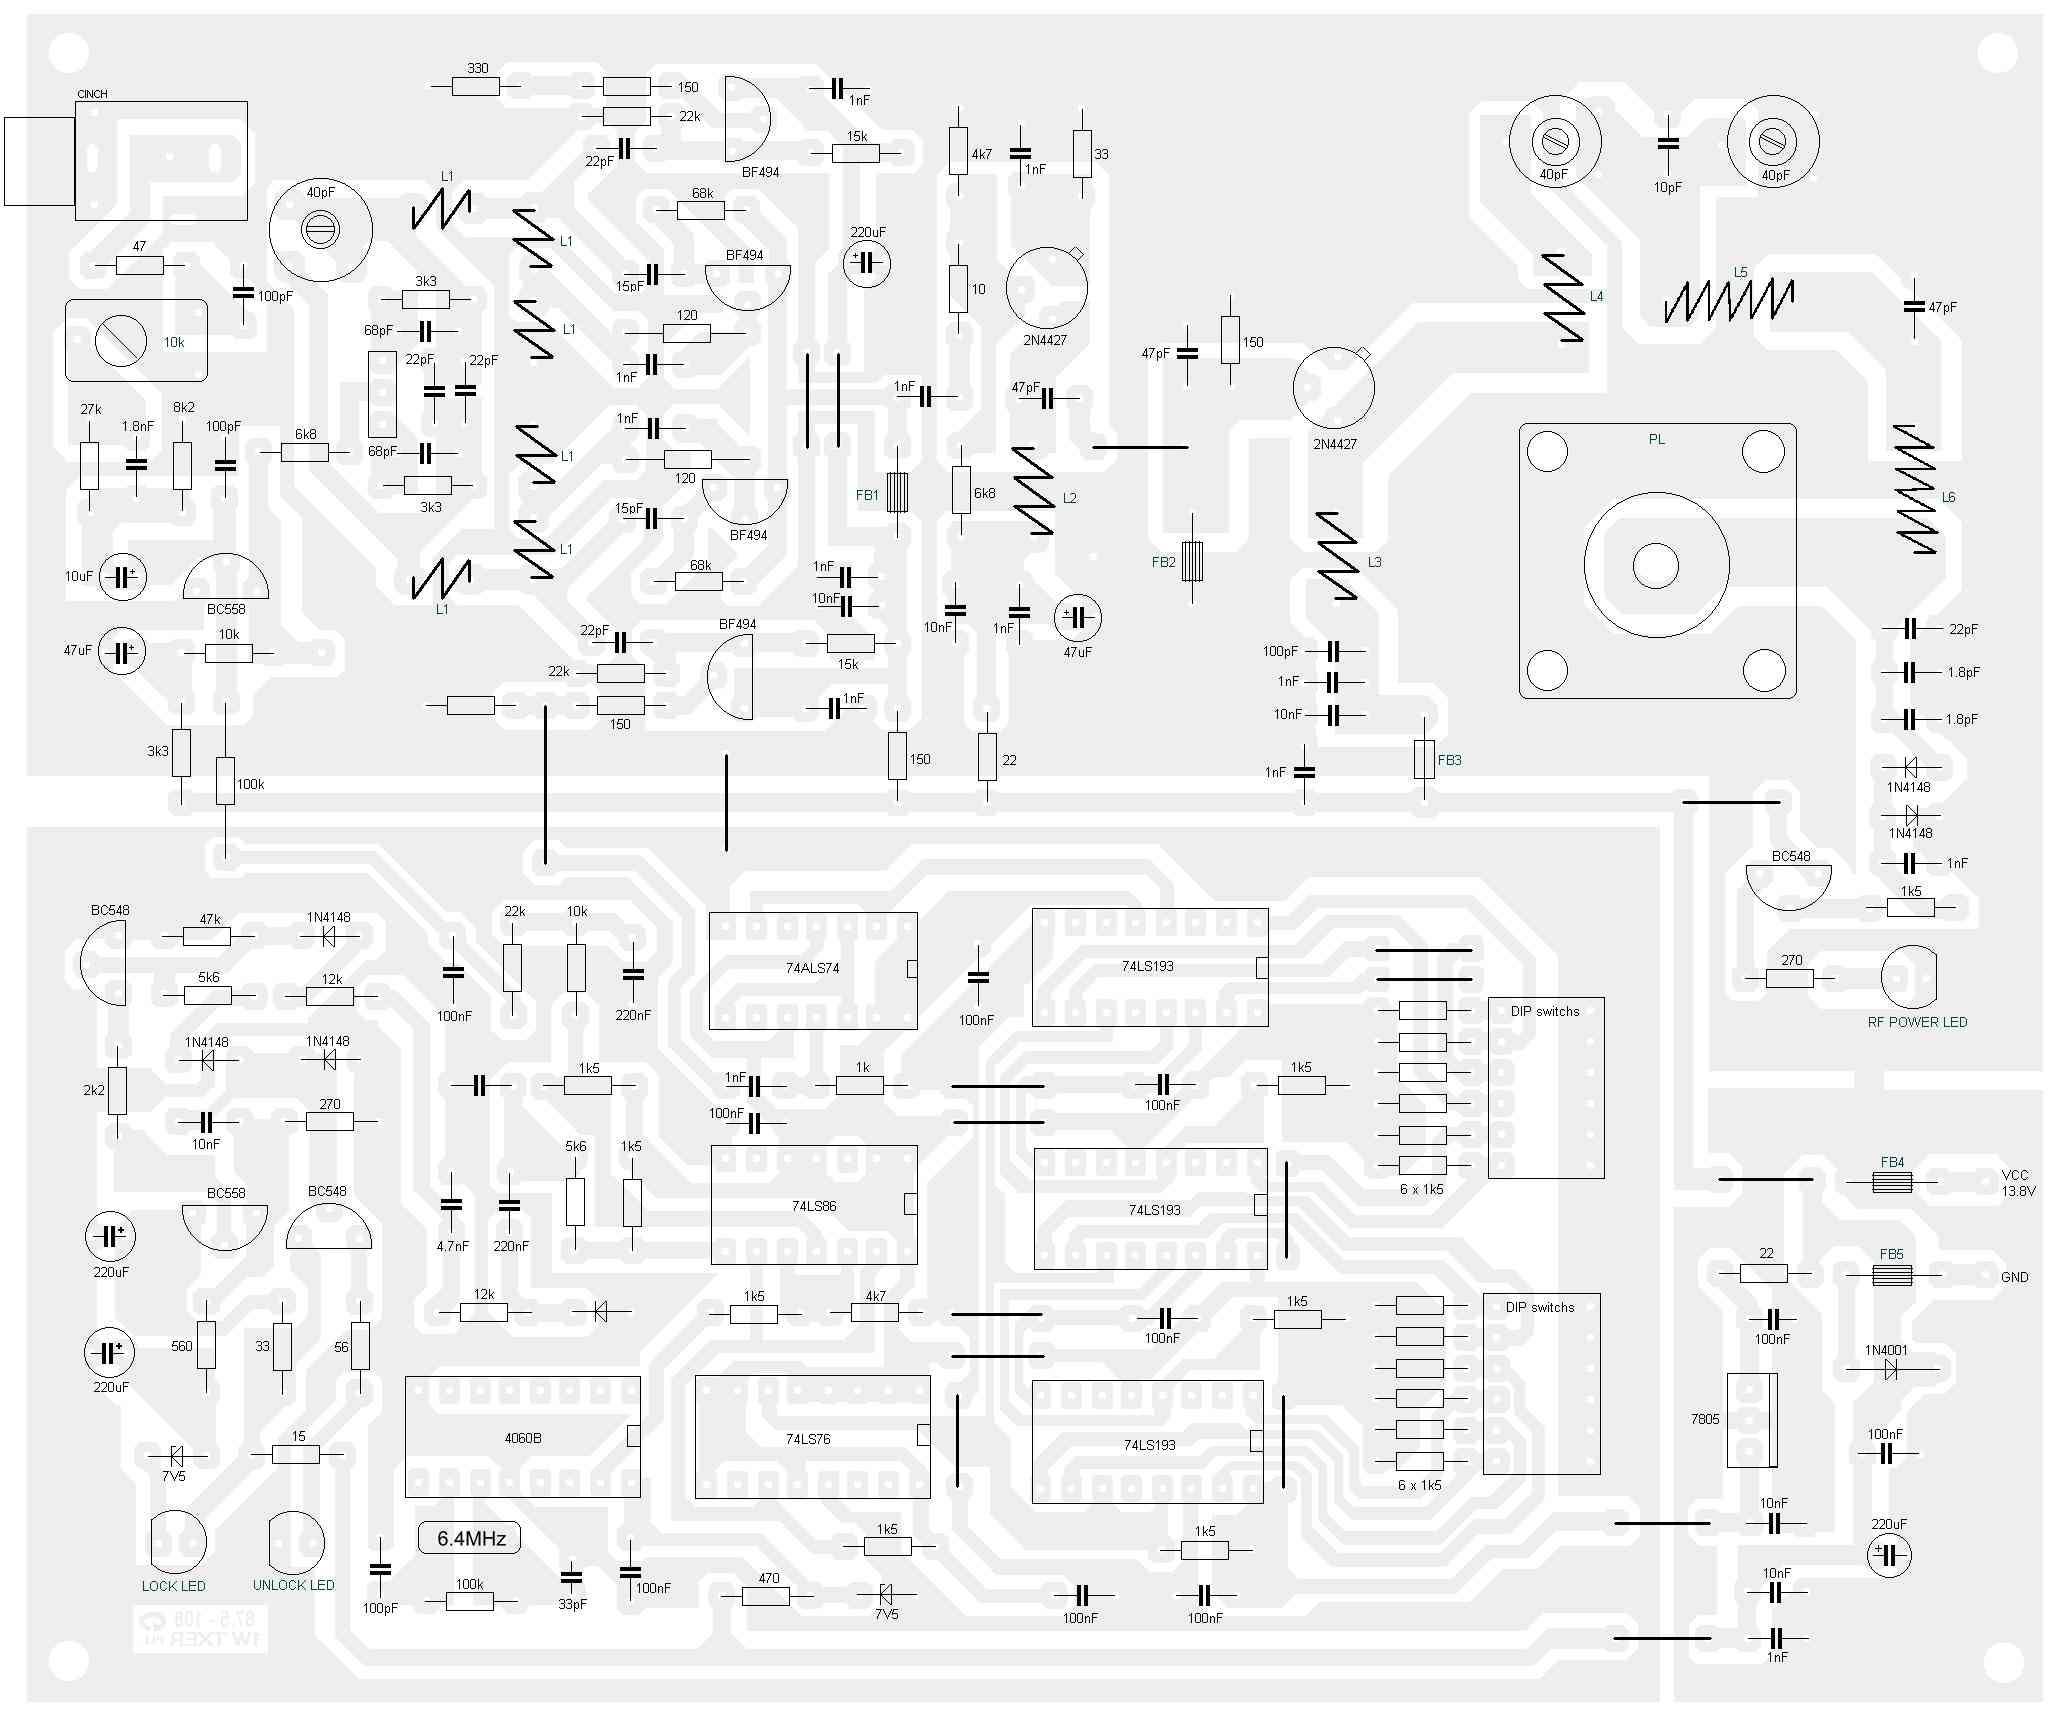 veronica 1w fm transmitter circuit